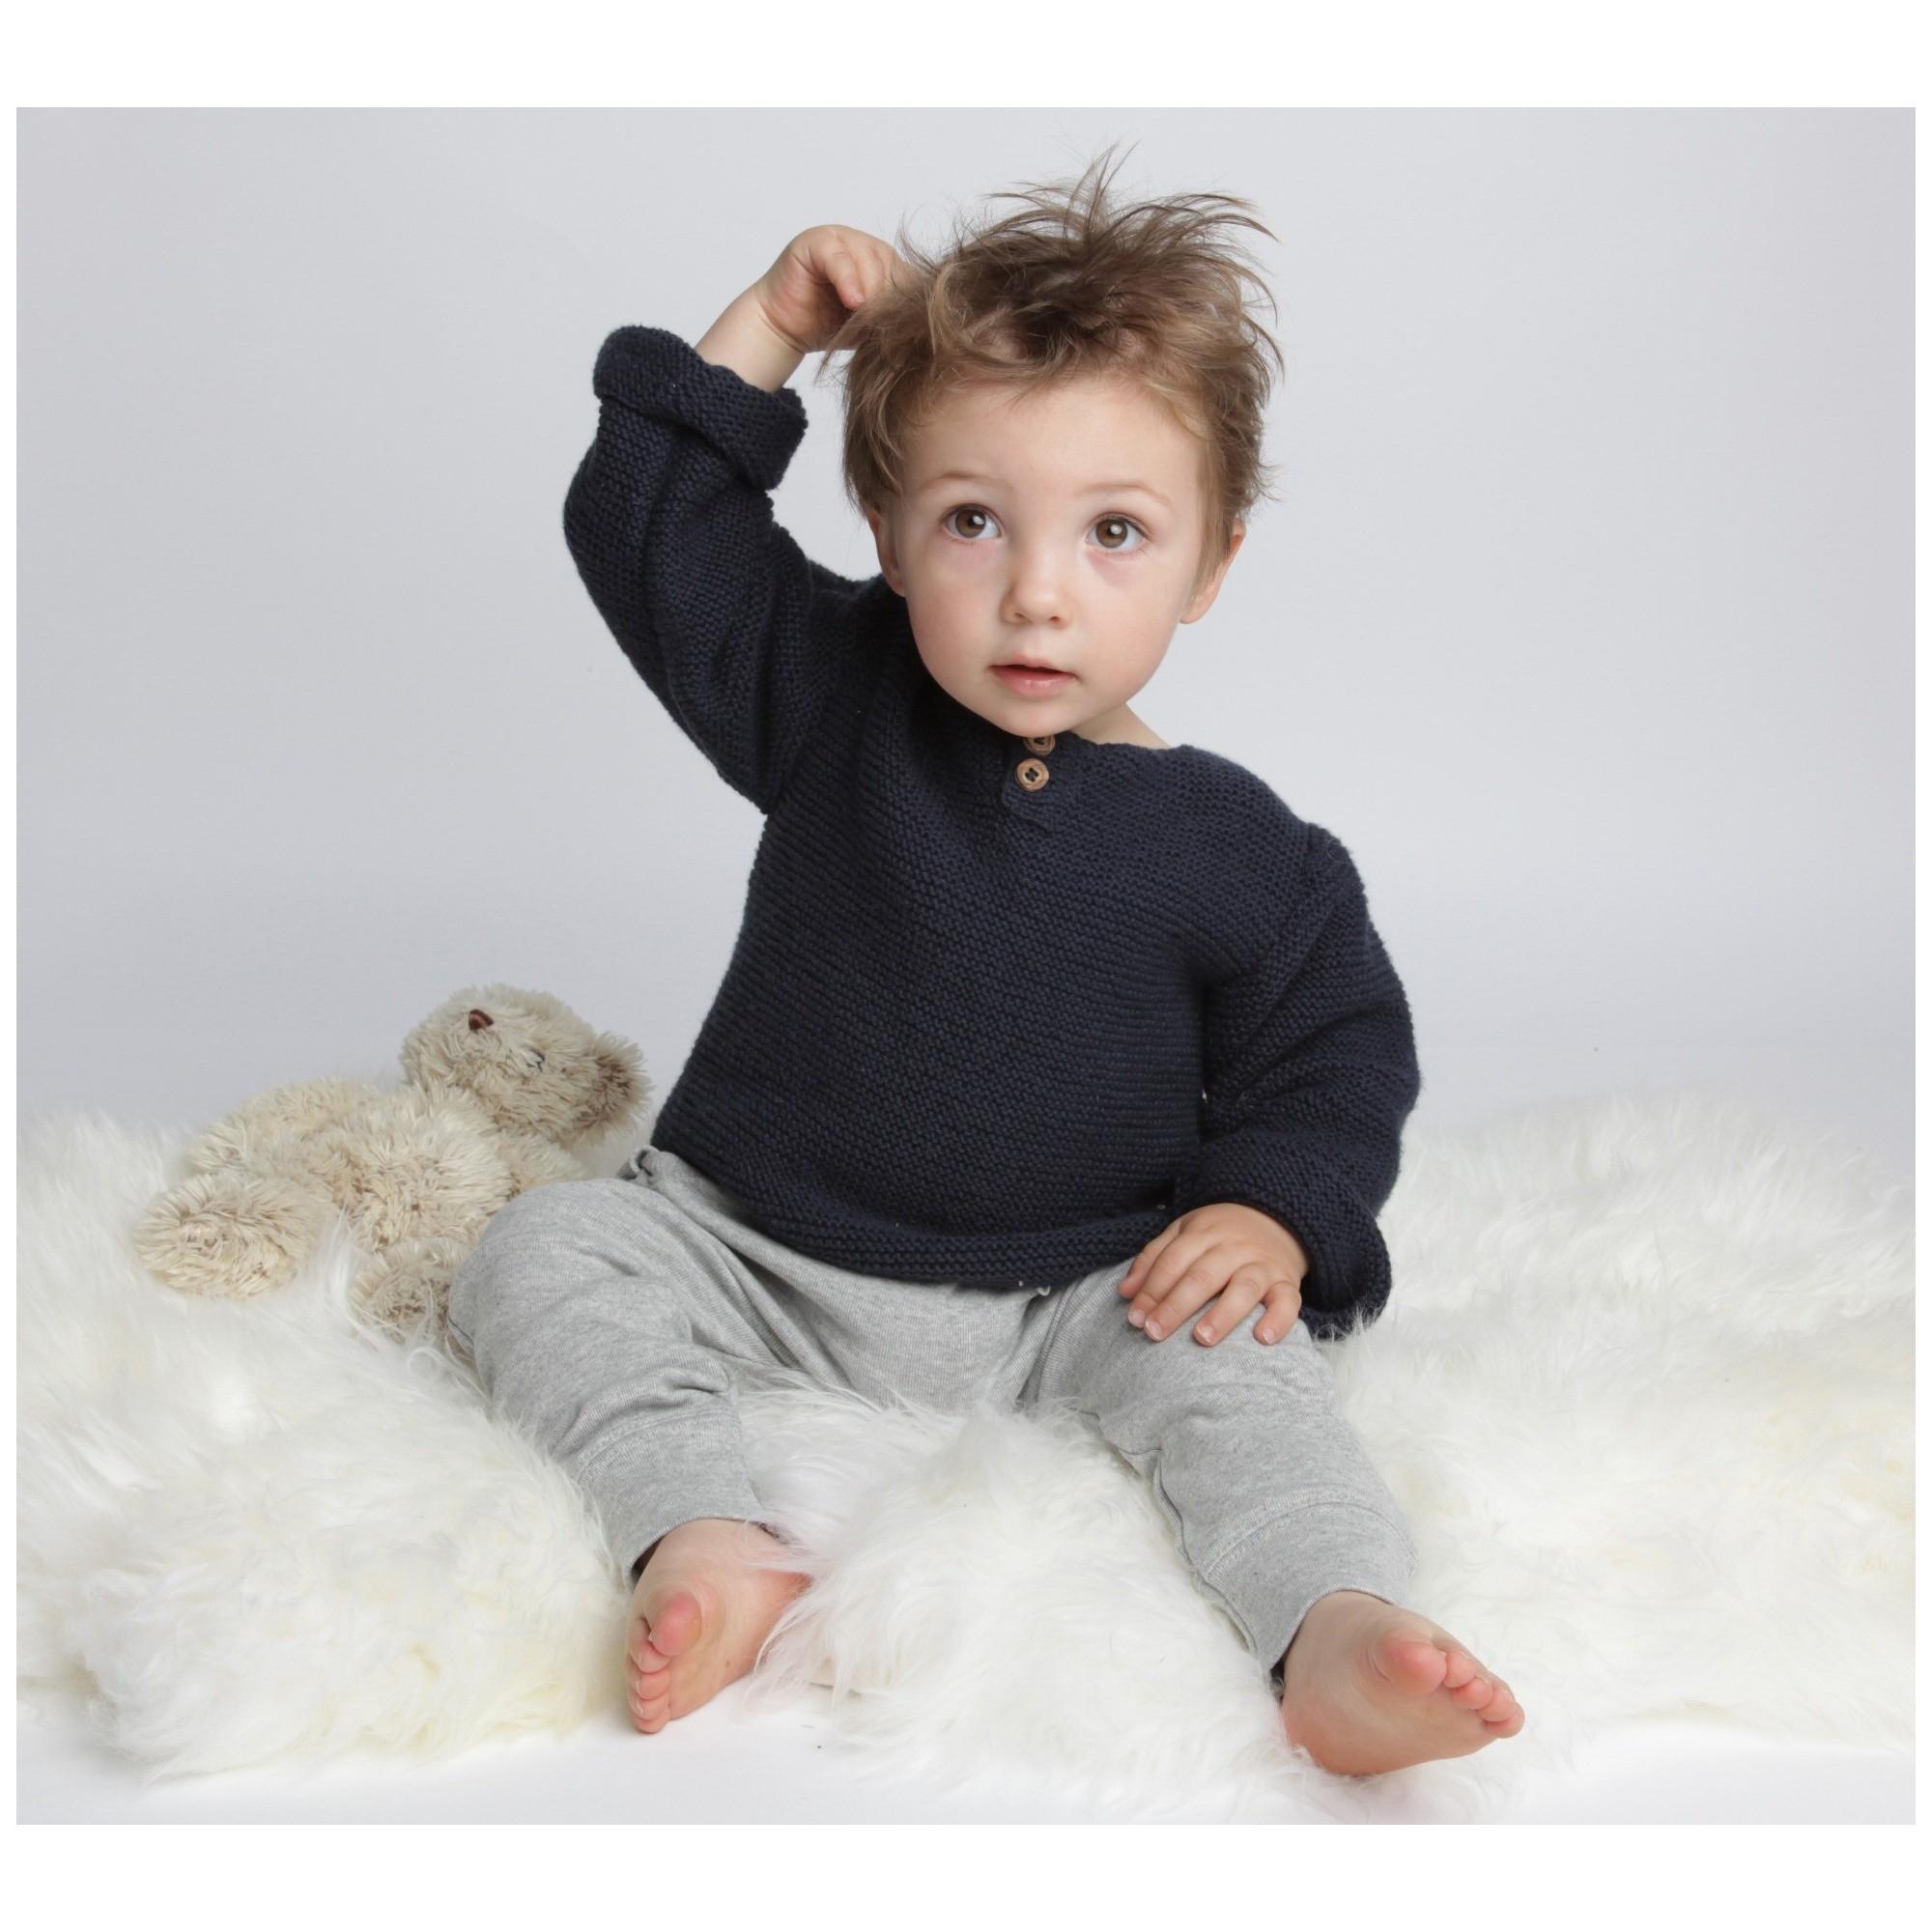 tricoter vetement bebe